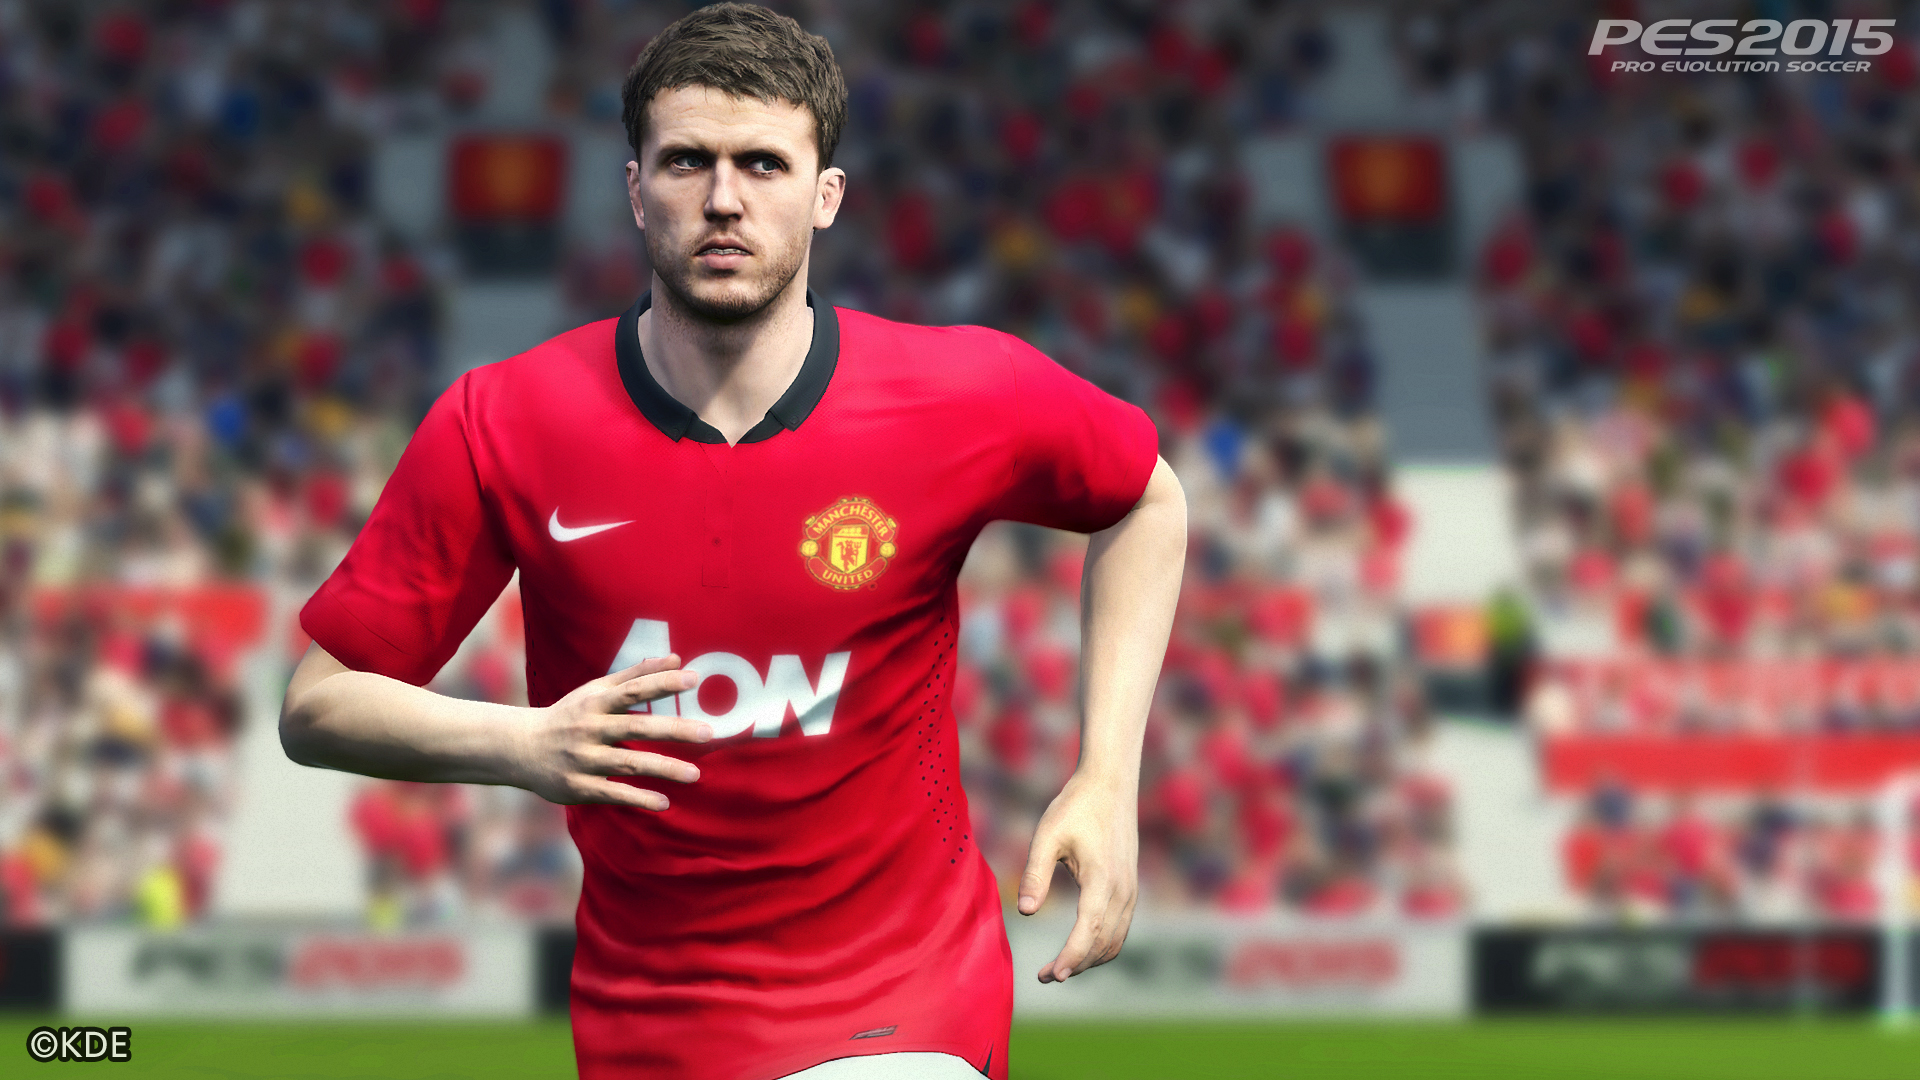 Pro Evolution Soccer 2015 (PES 2015) - Steam